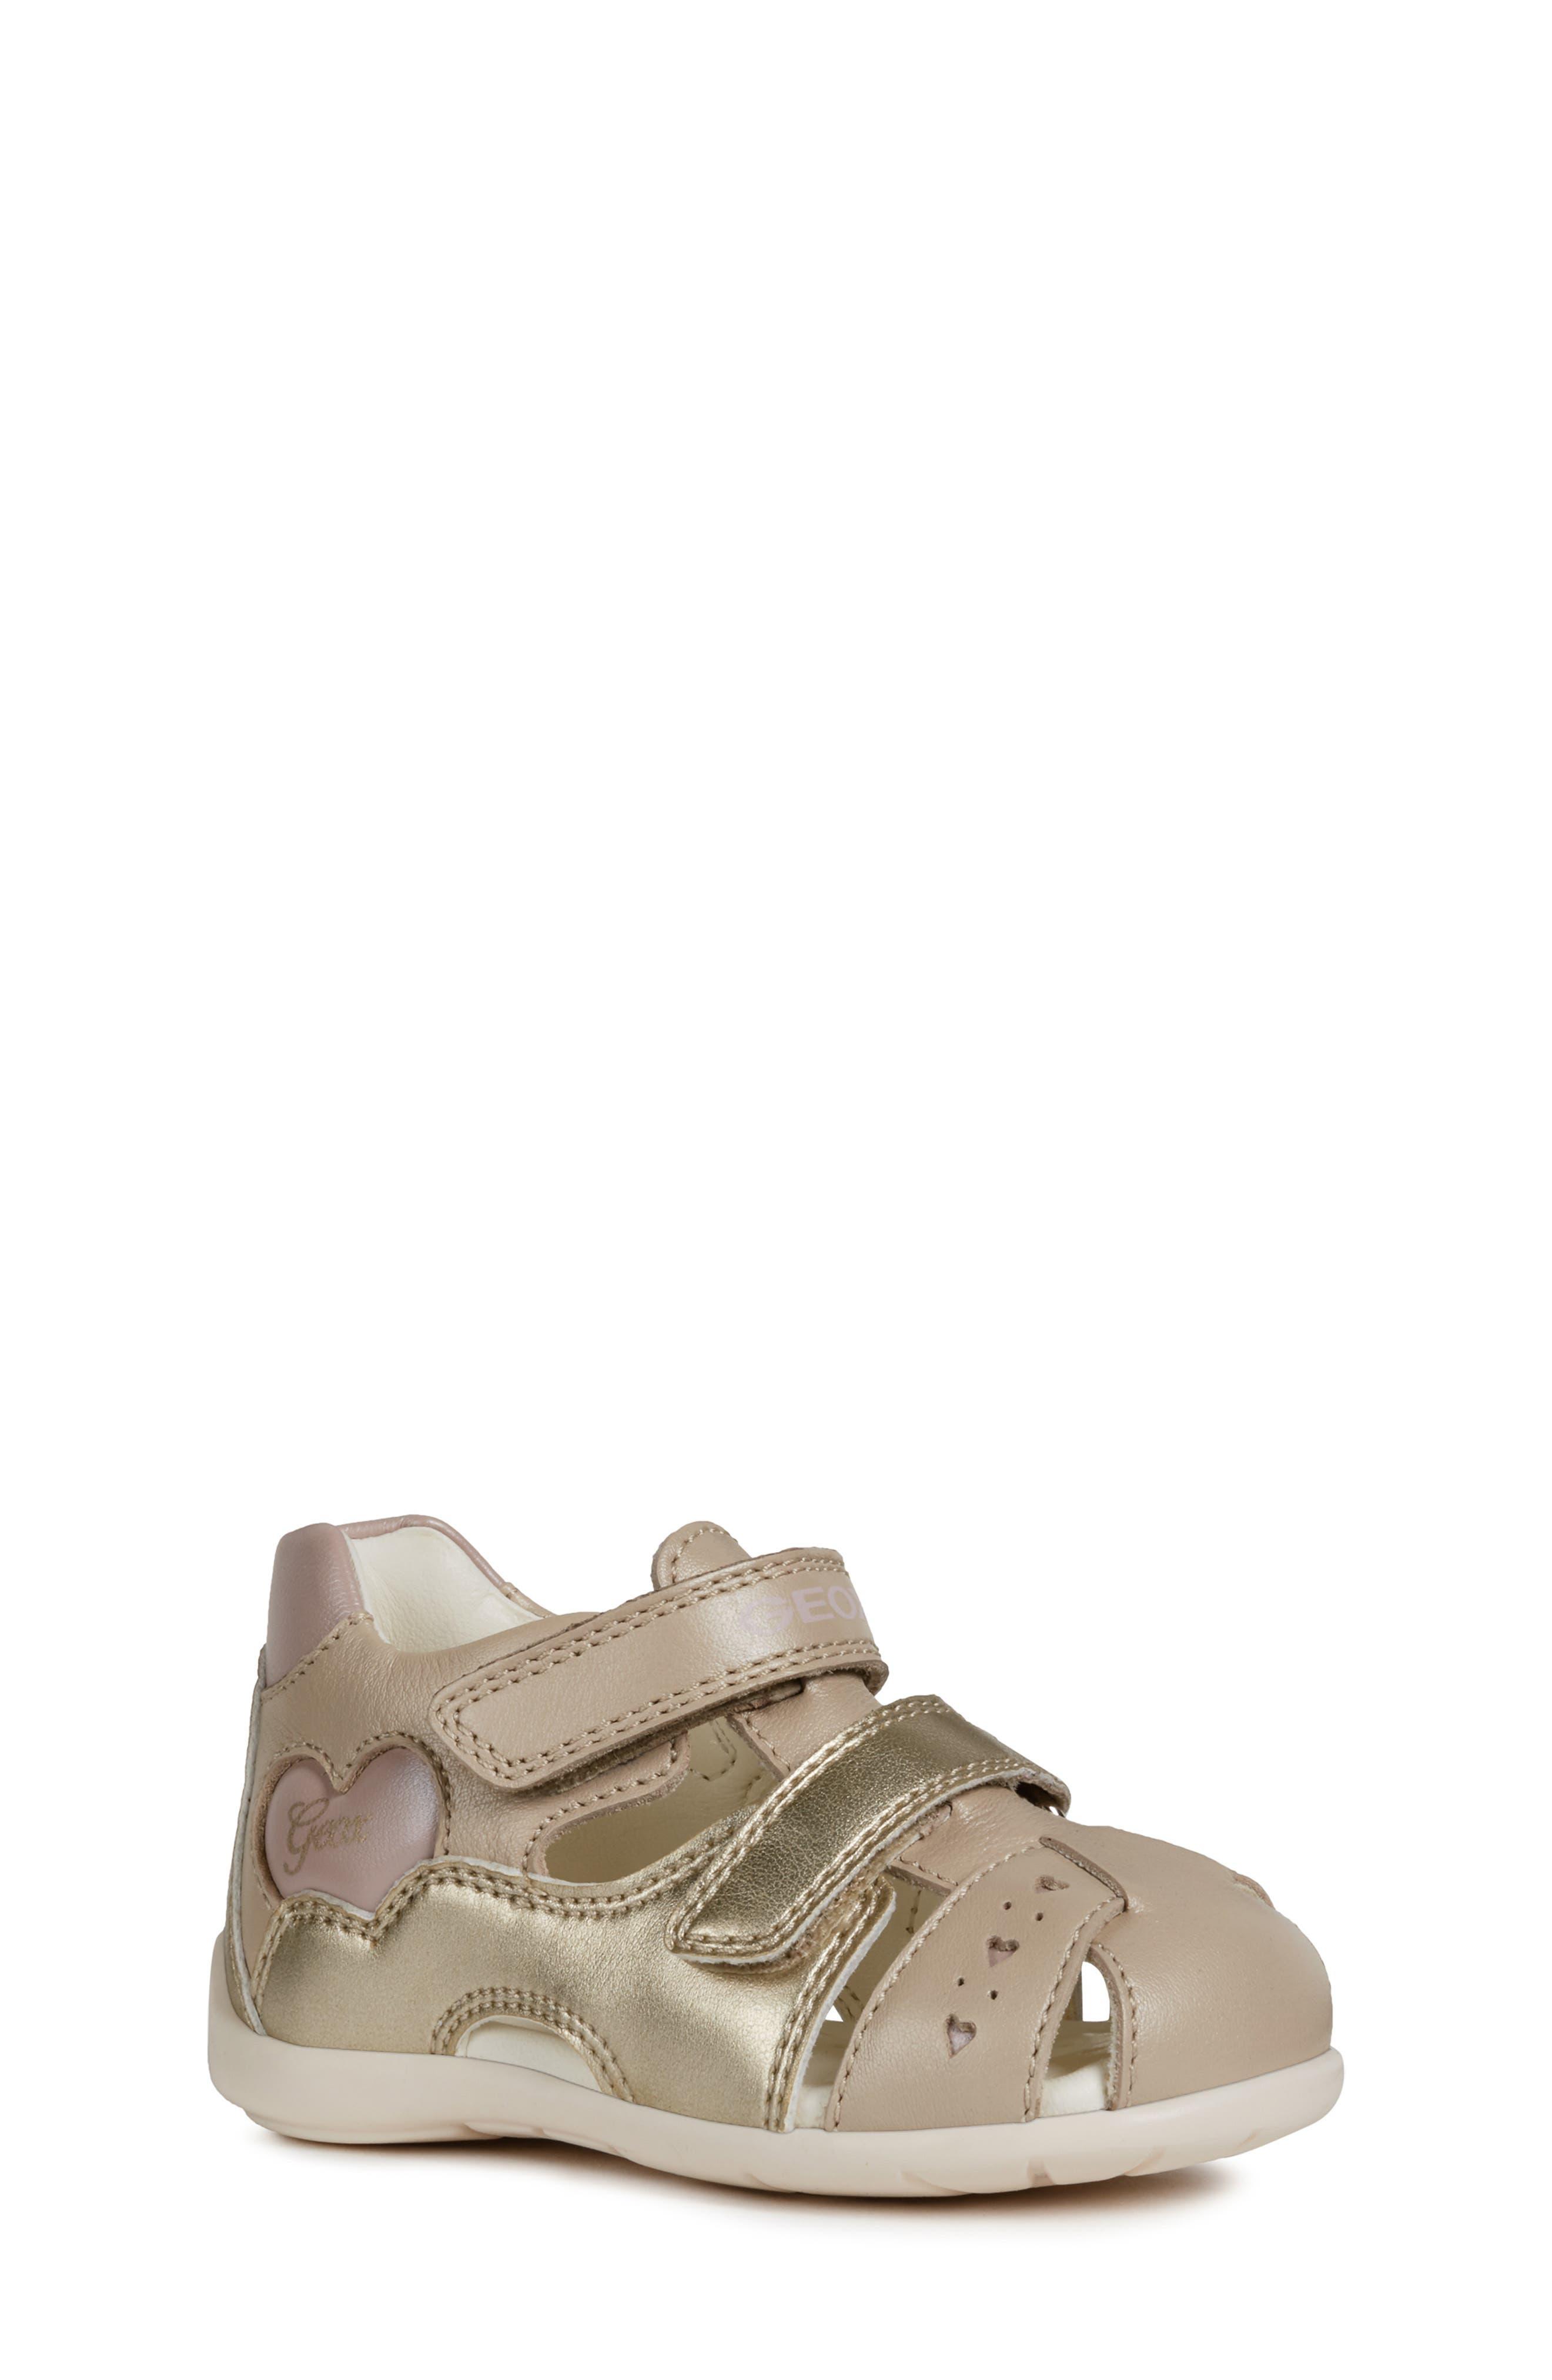 Girls Geox Kaytan 52 Shimmery Sandal